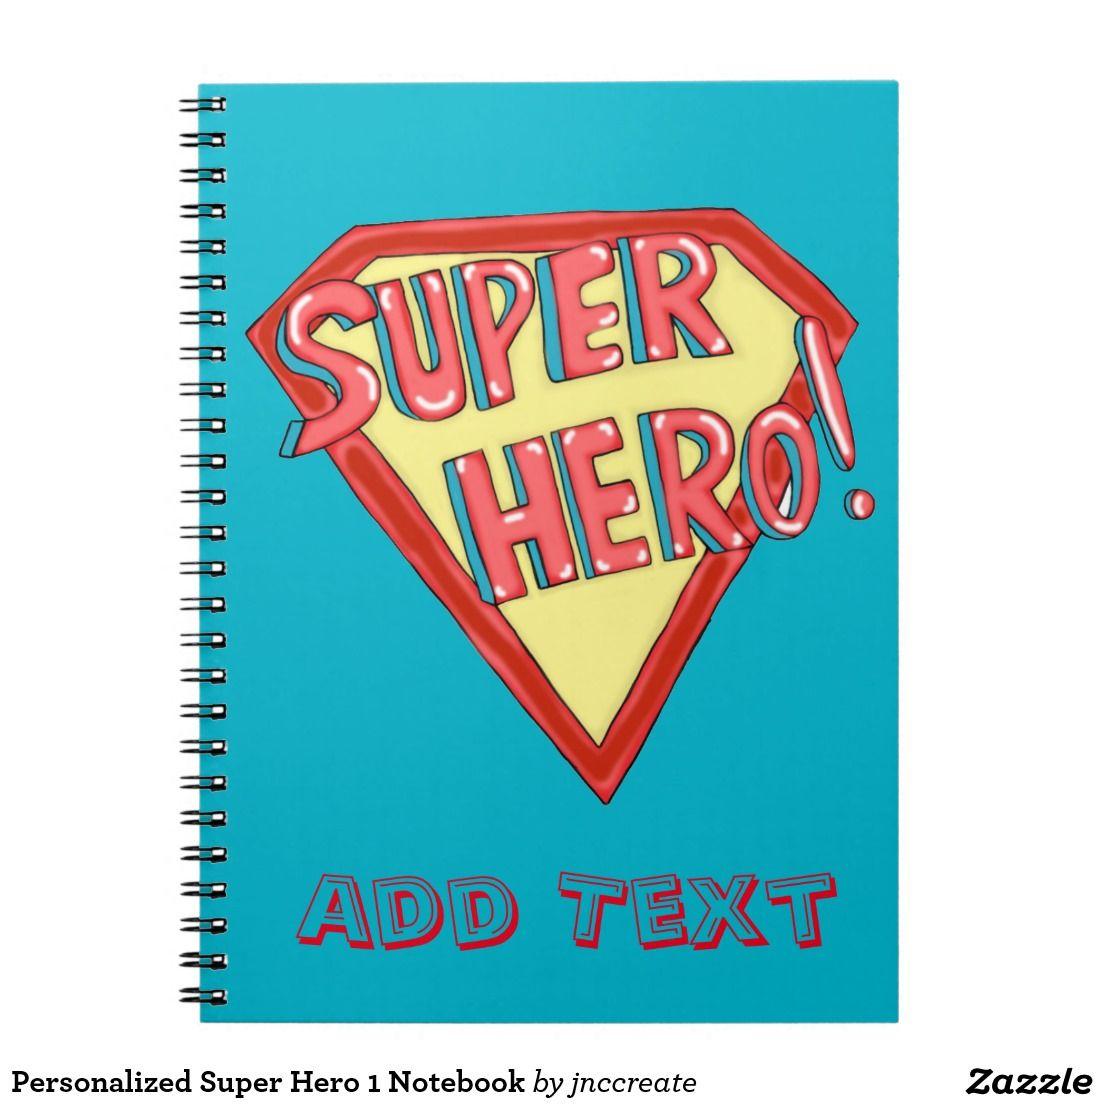 Personalized Super Hero 1 Notebook